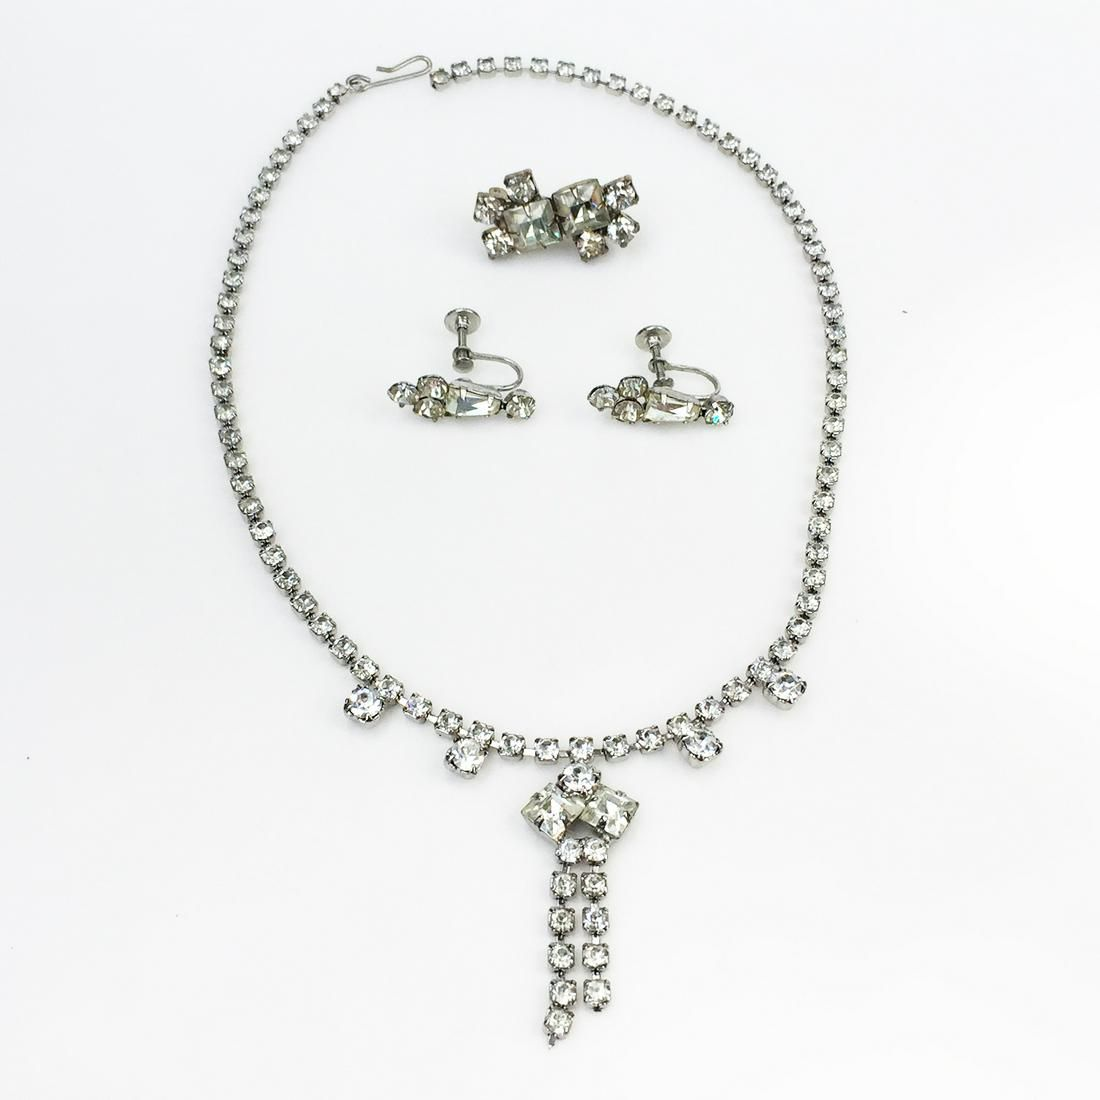 Vintage silver tone crystal ear clips, necklace, brooch